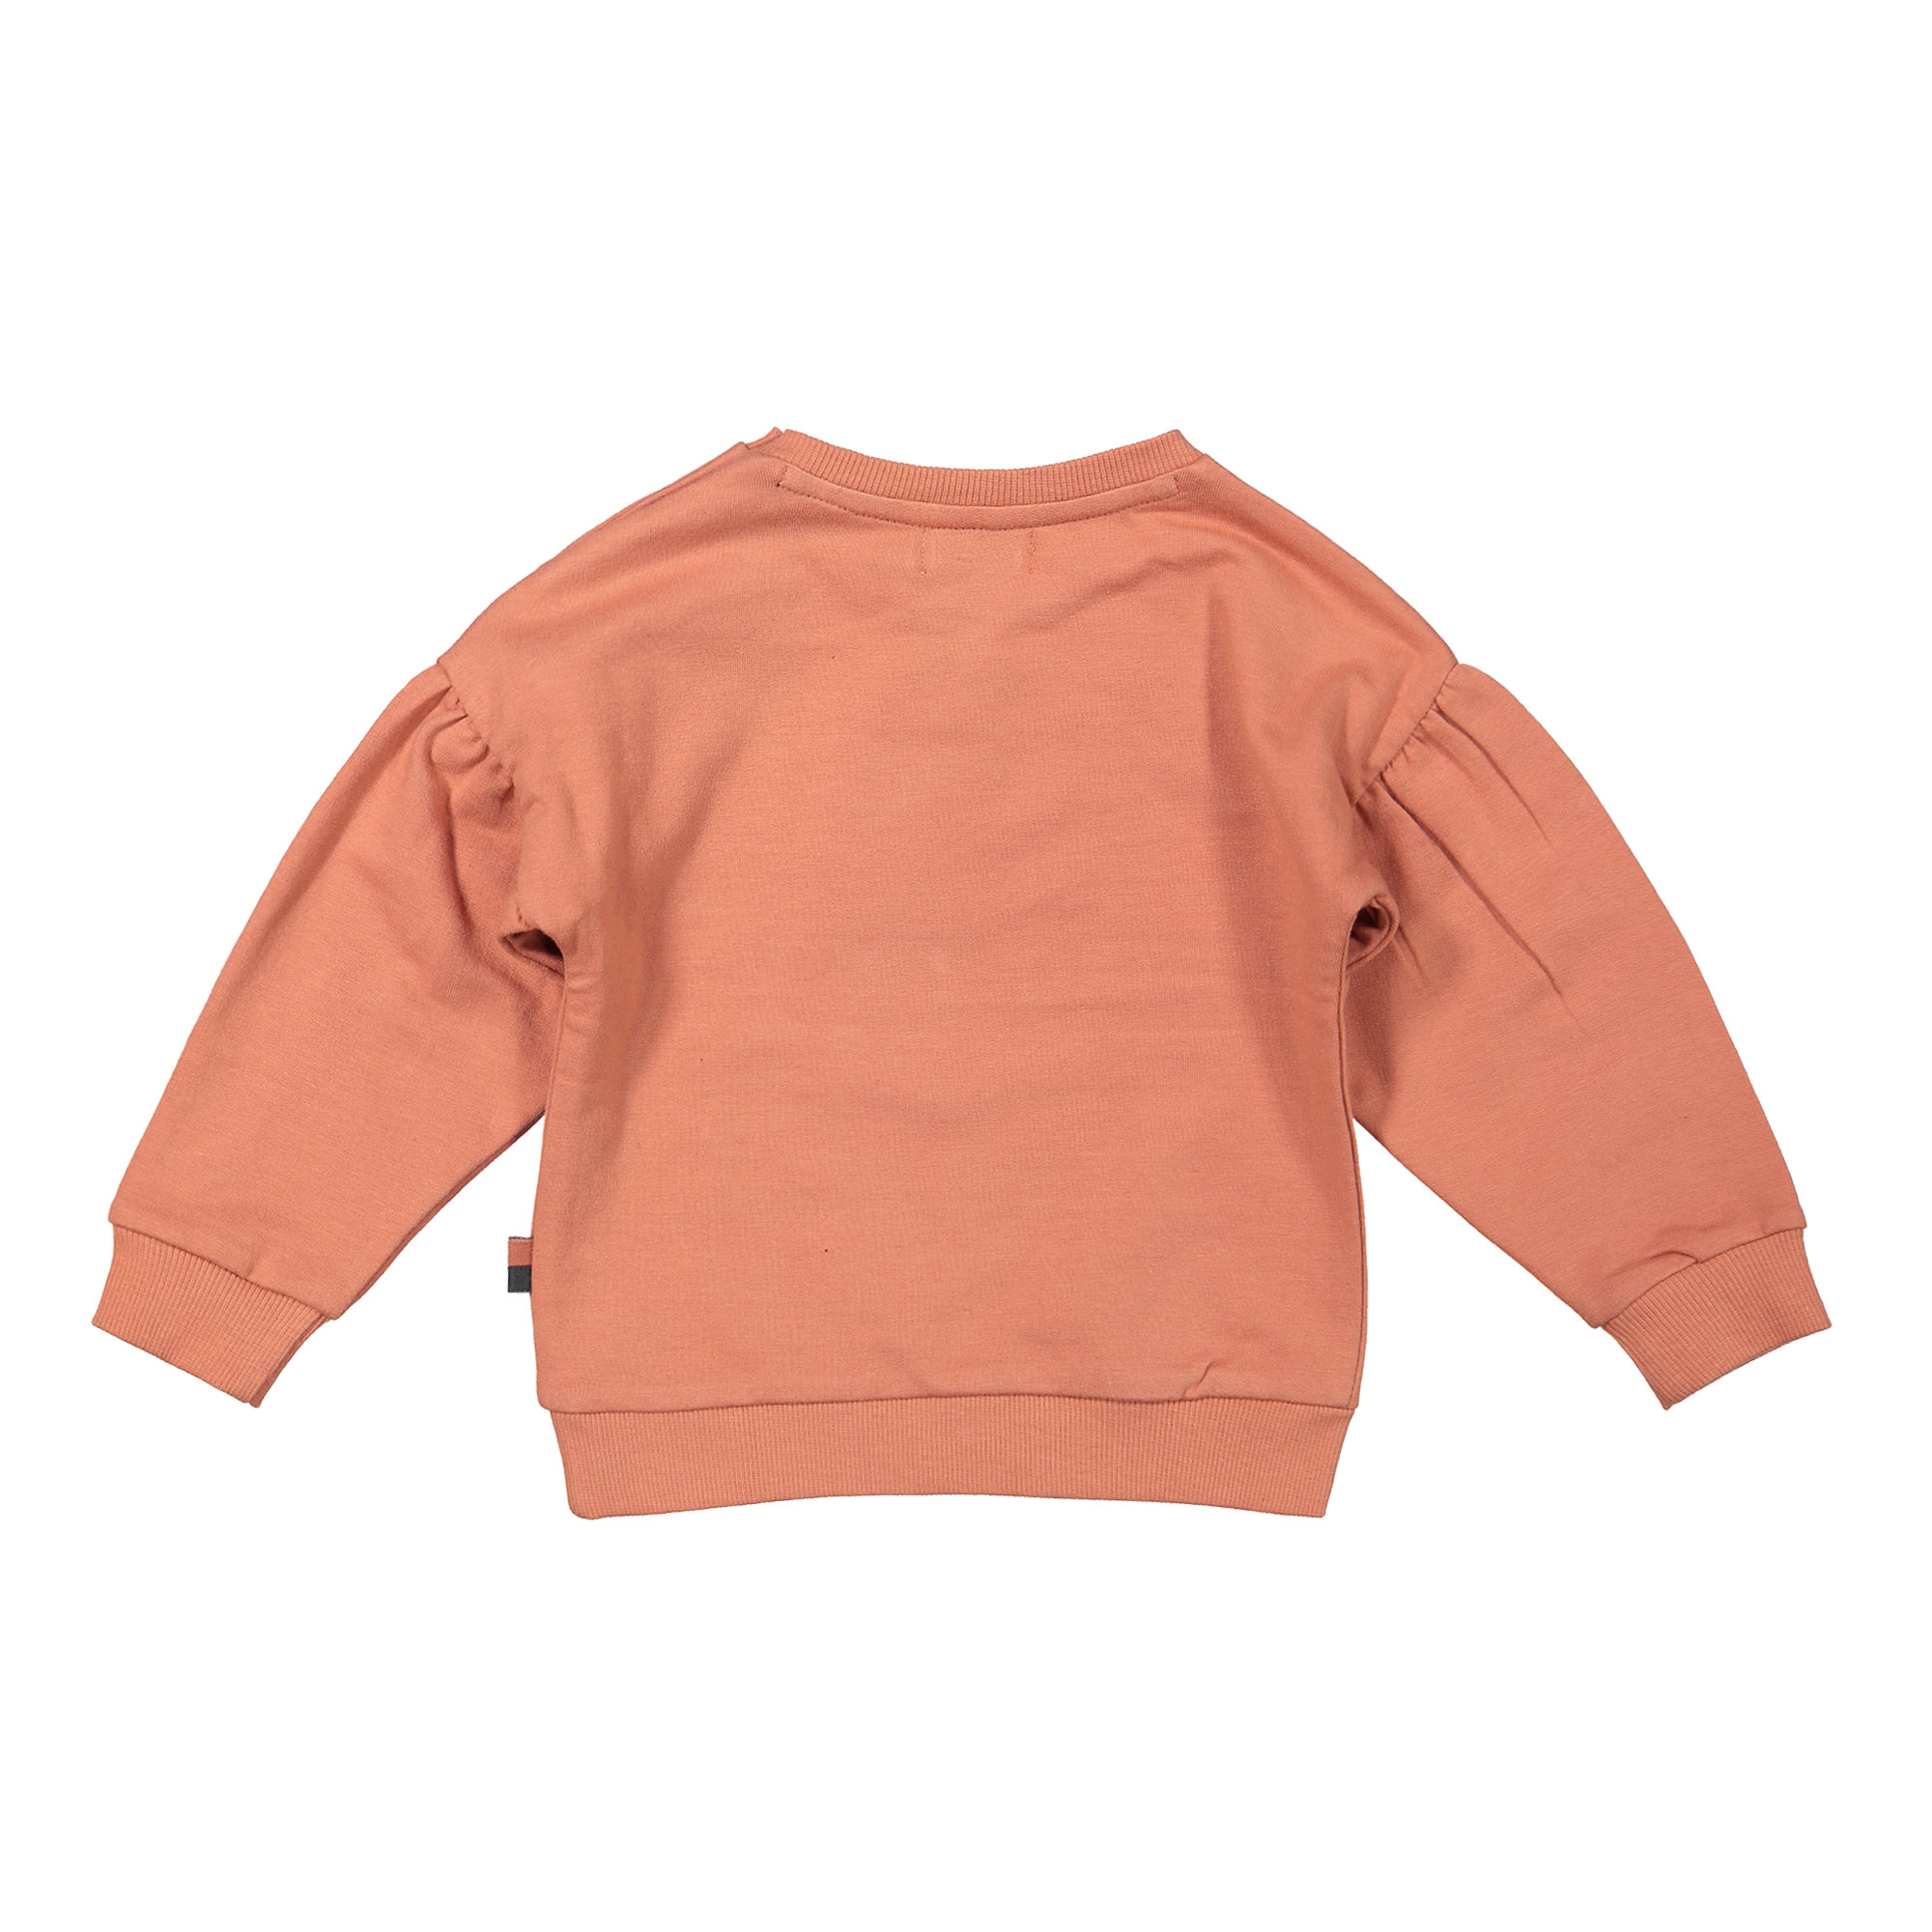 More Joy Sweater